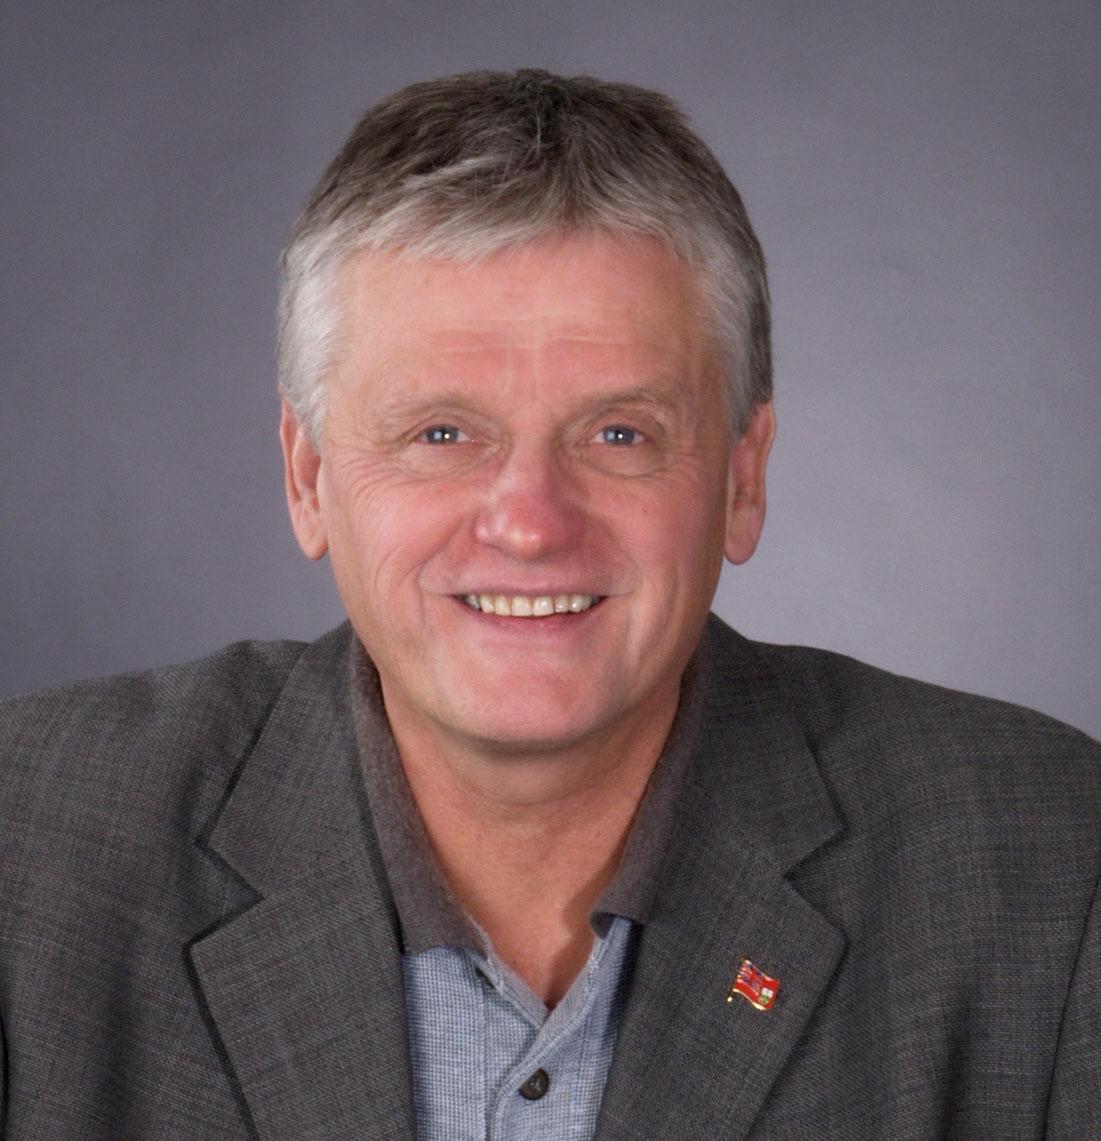 Toby Barrett, MPP Haldimand Norfolk